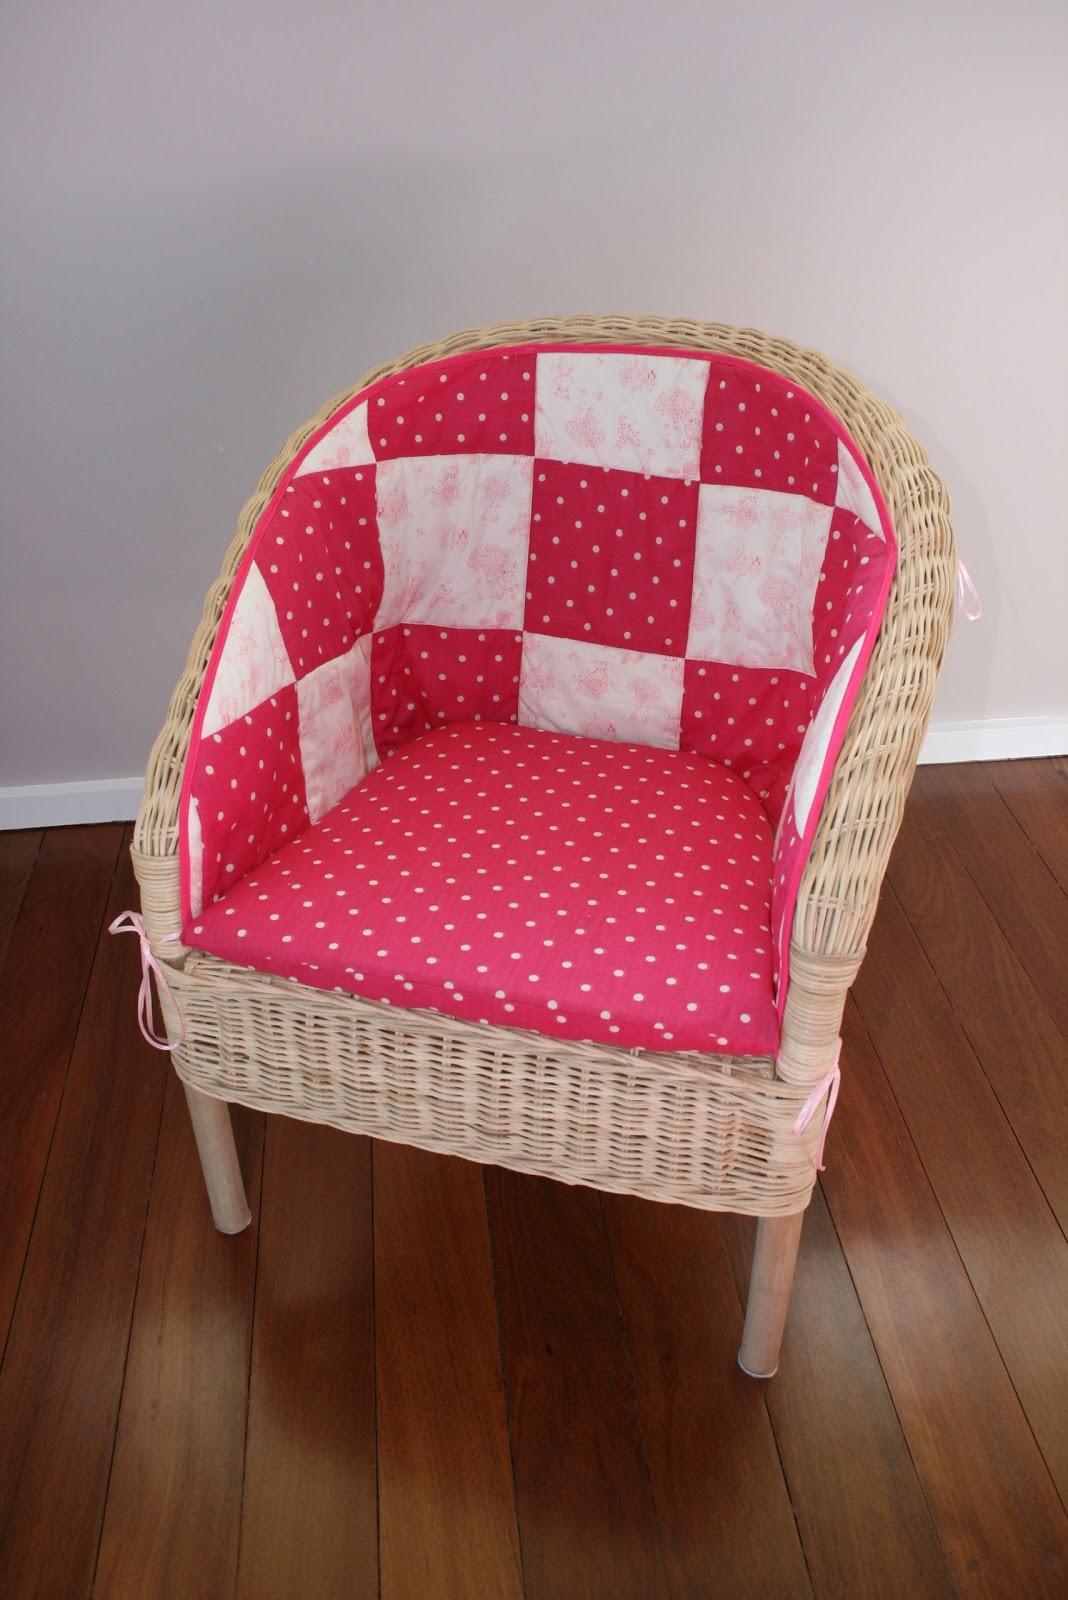 Ikea Children's Chair Covers La Z Boy Lift Remote Liese And Alyssa Agen Children 39s Armchair Cover